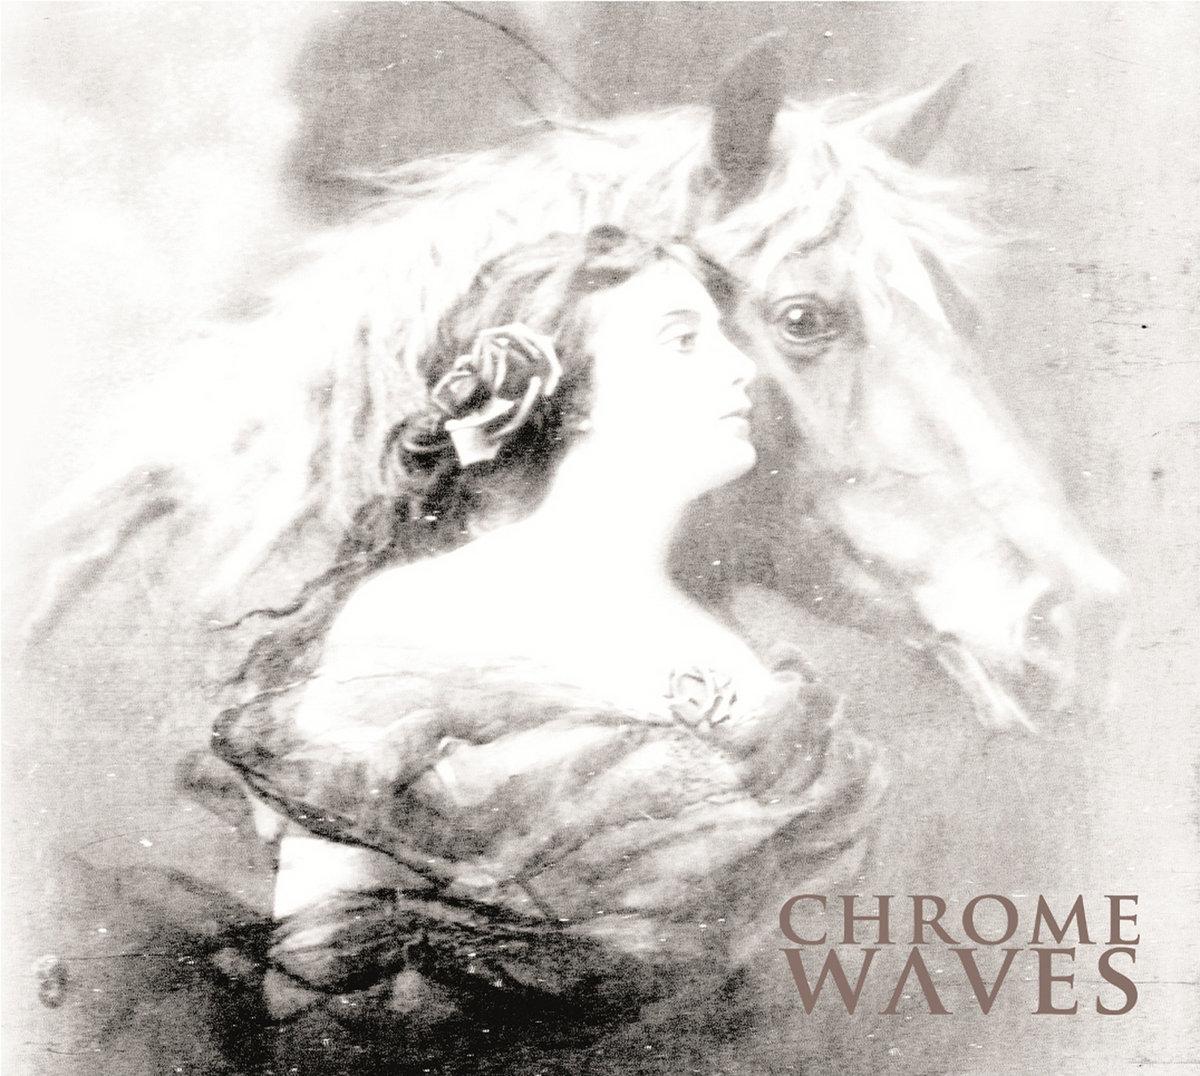 Chrome Waves | Chrome Waves